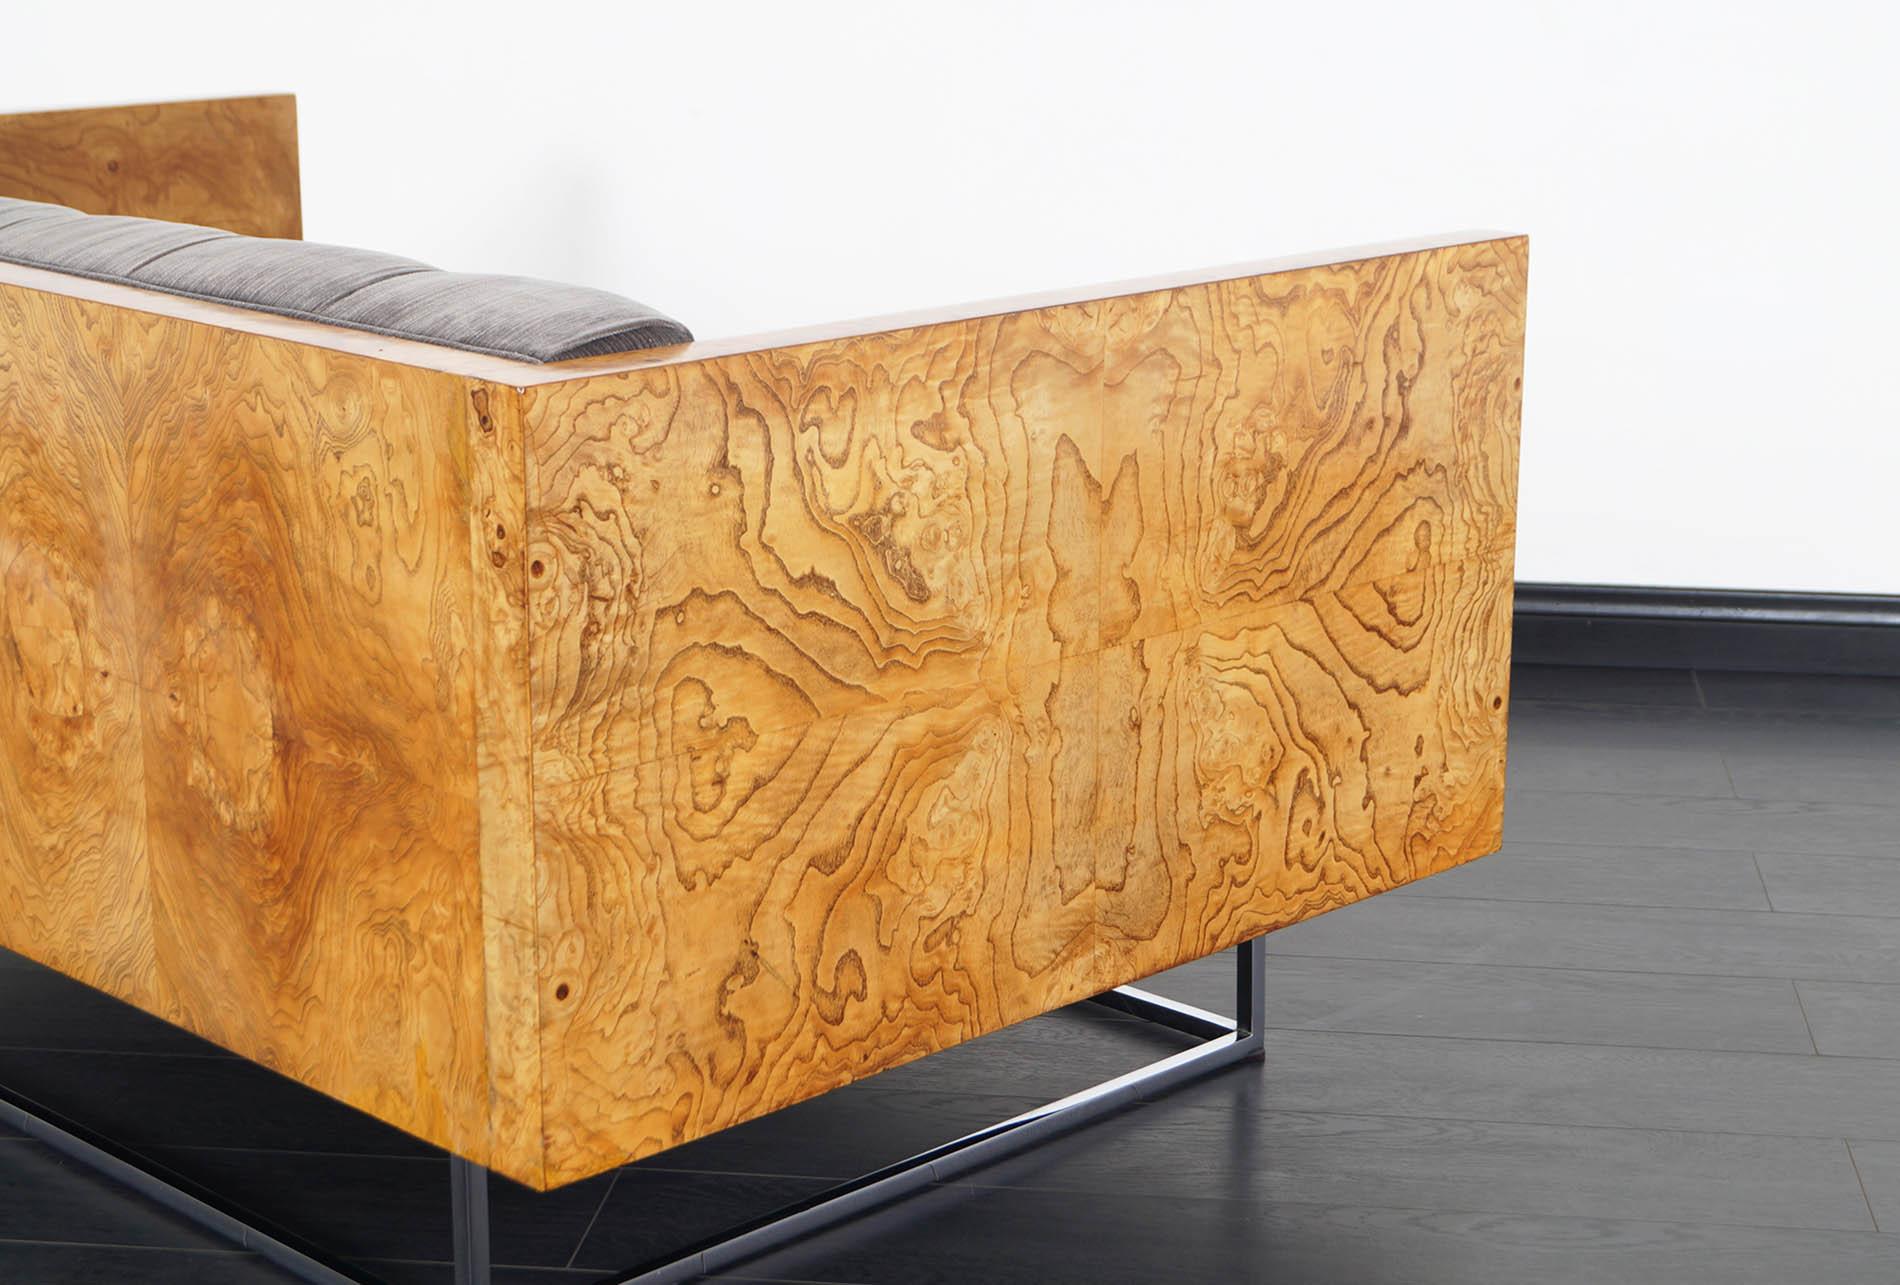 Vintage Burl Wood Case Loveseat by Milo Baughman